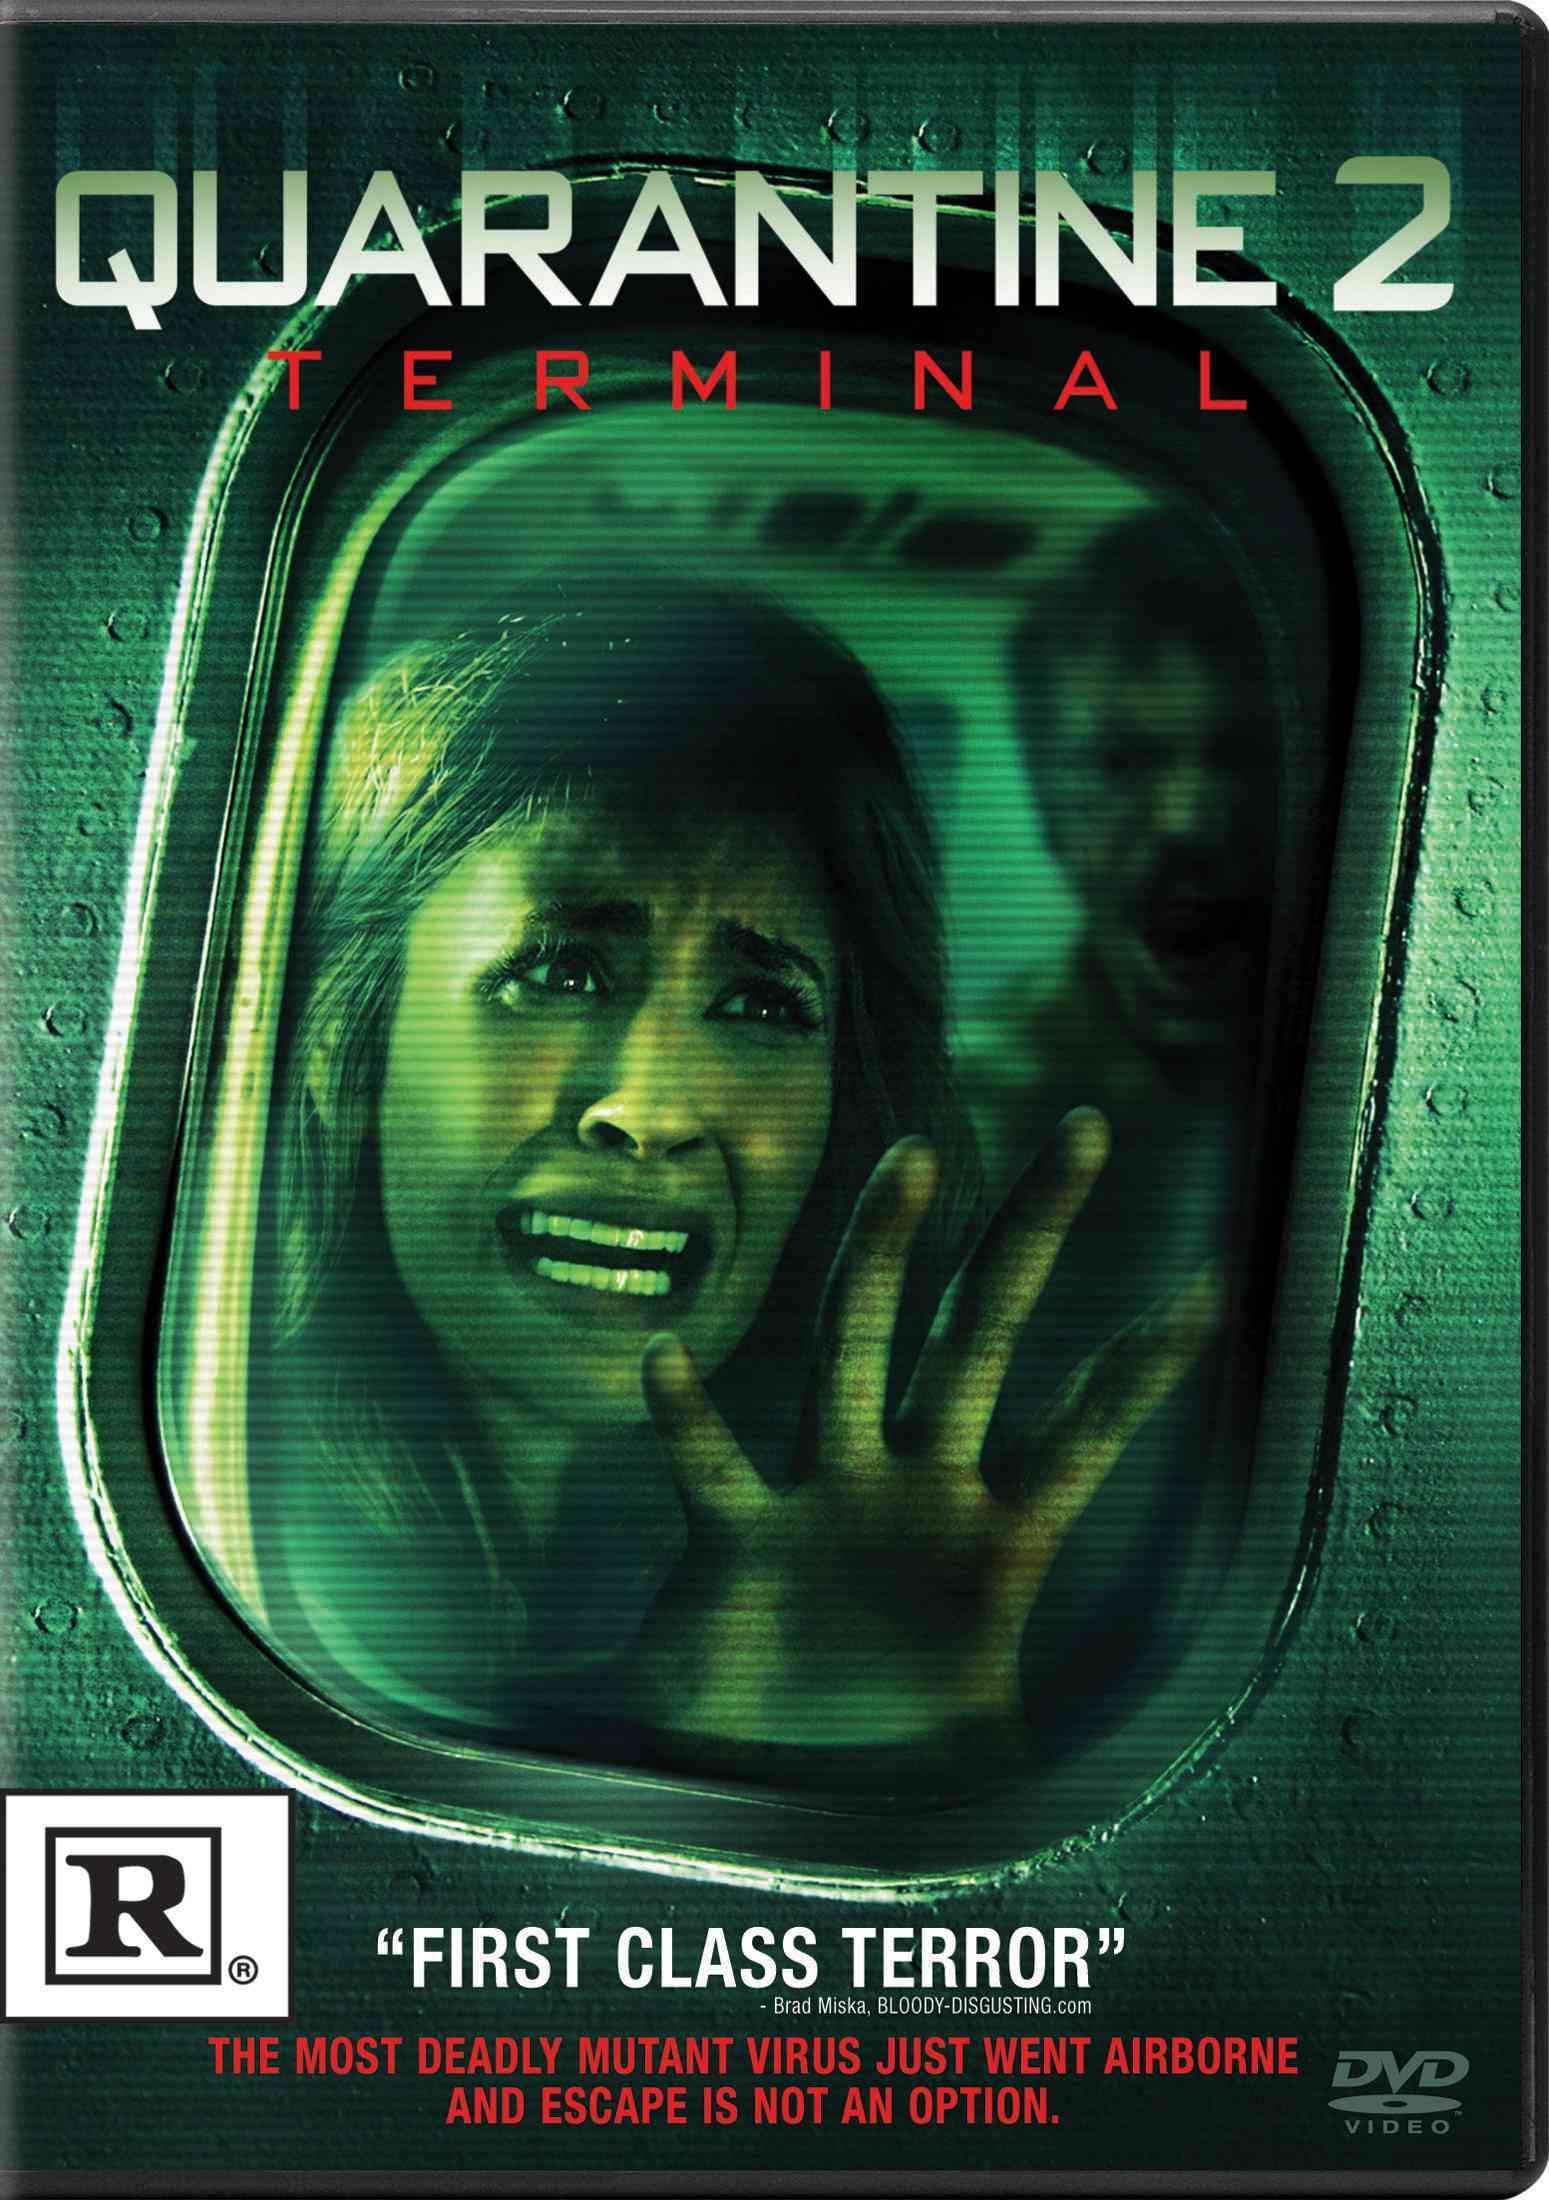 QUARANTINE 2:TERMINAL BY BACK,GEORGE (DVD)